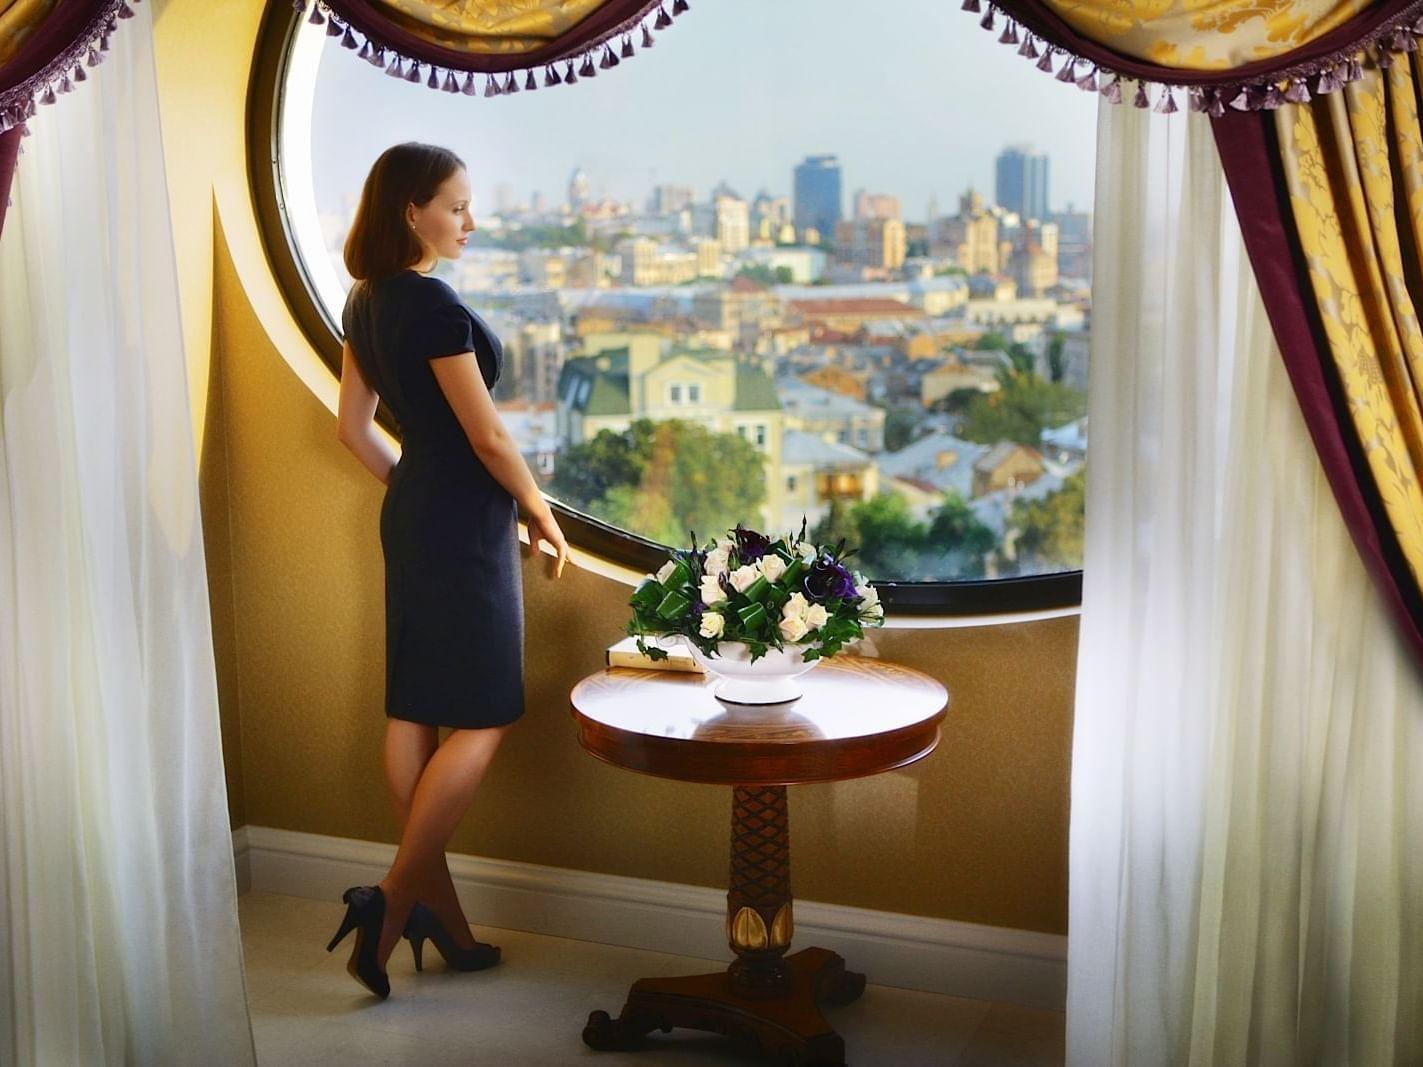 Enjoying view in Royal Suite at Intercontinental Kyiv hotel